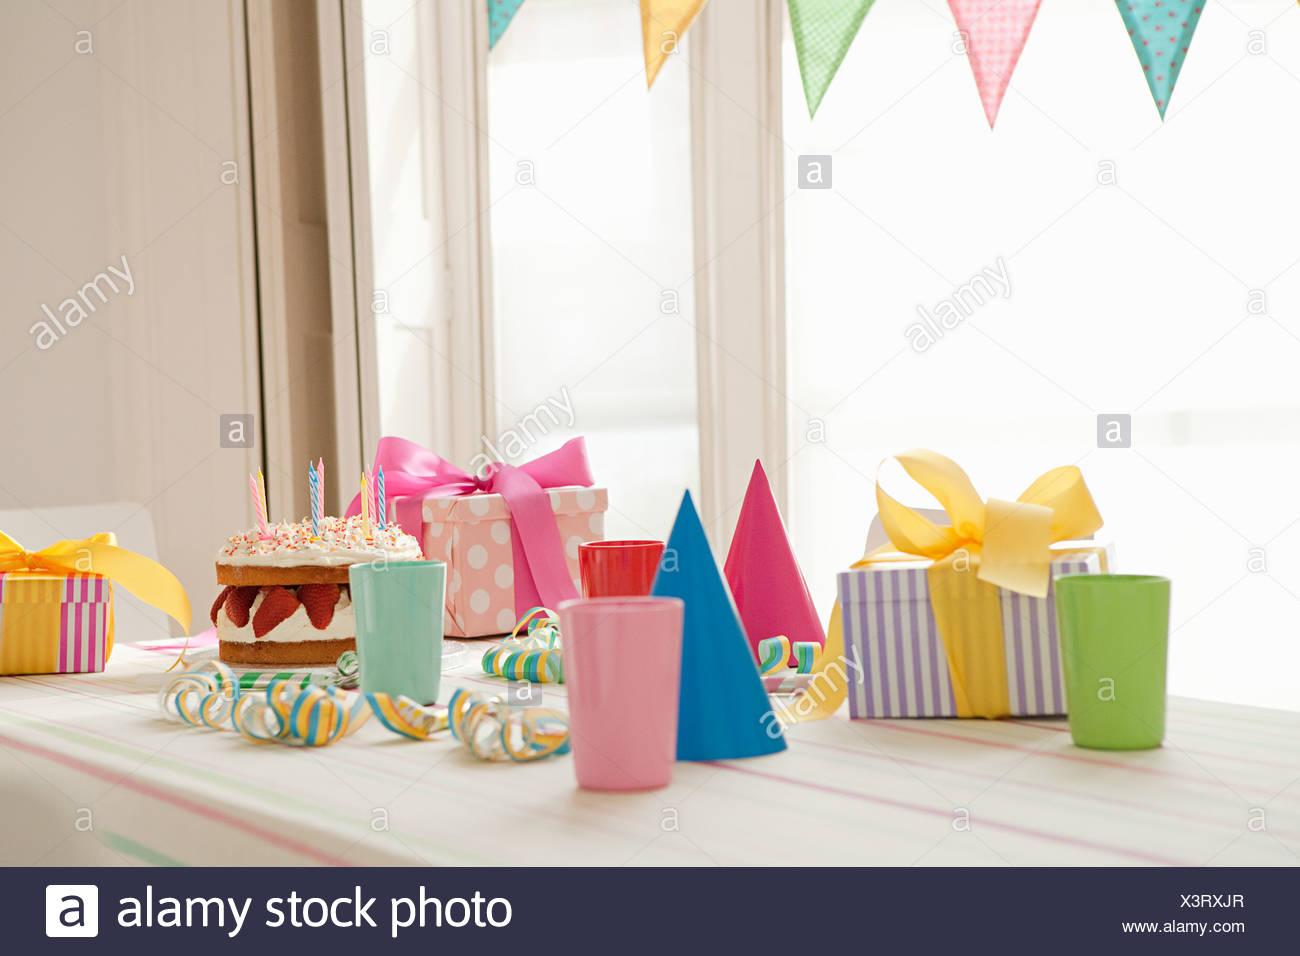 Birthday party preparation - Stock Image